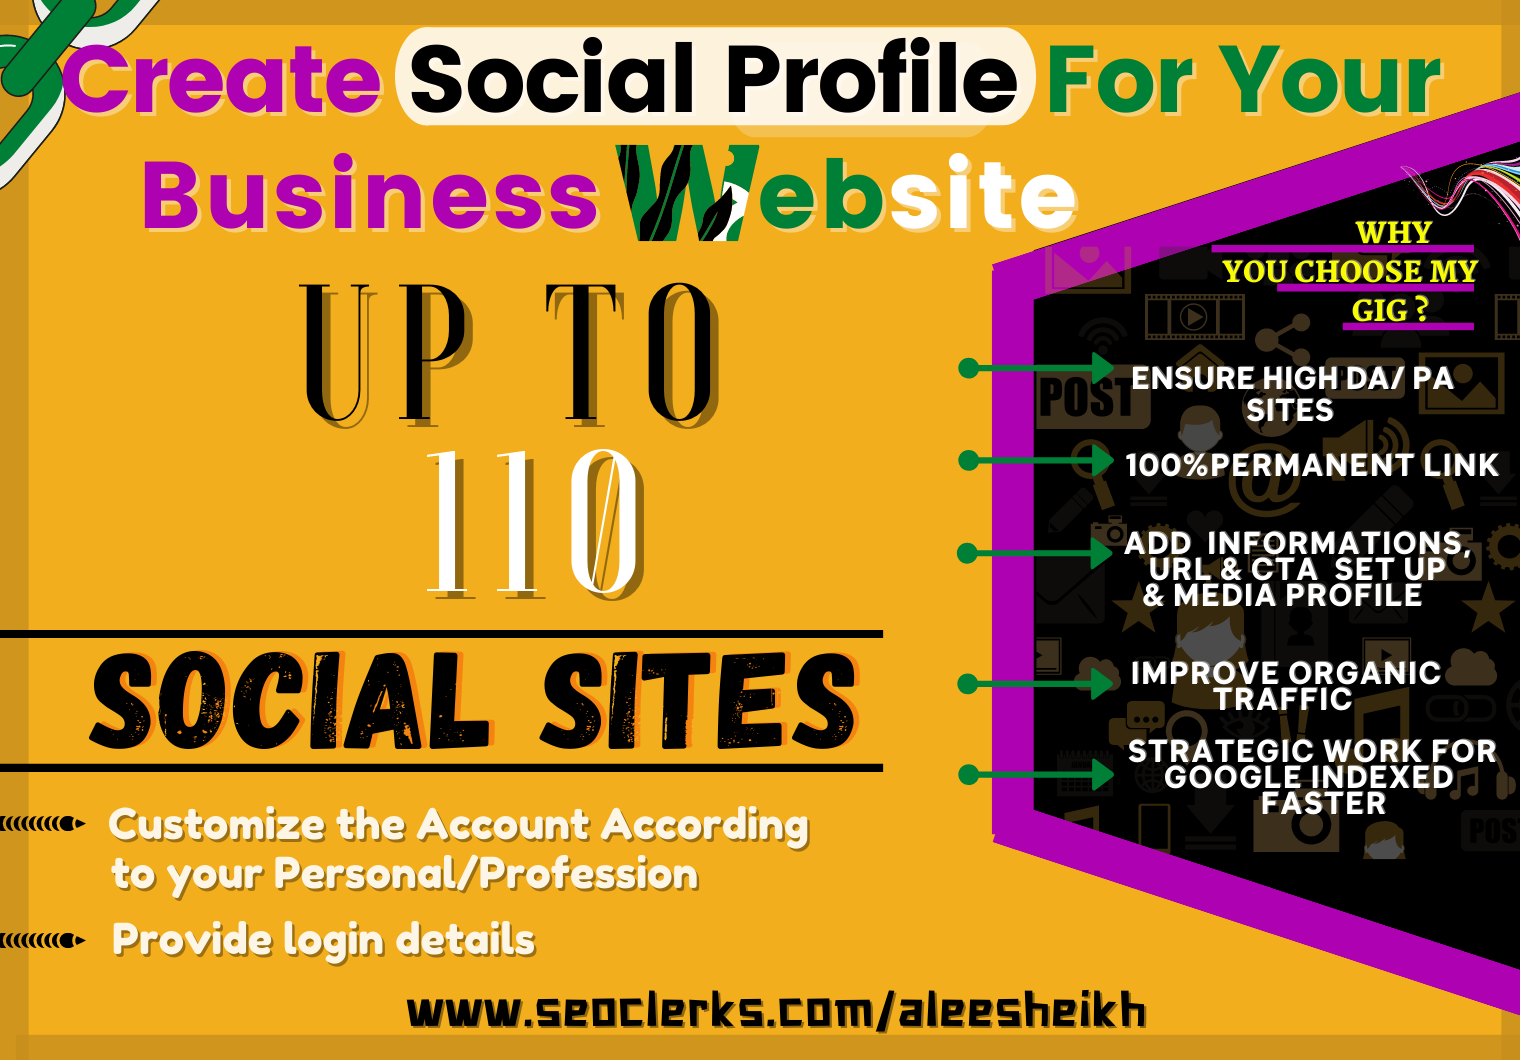 I will Setup 110 Social Profile for branding your business & Get strong backlink for website